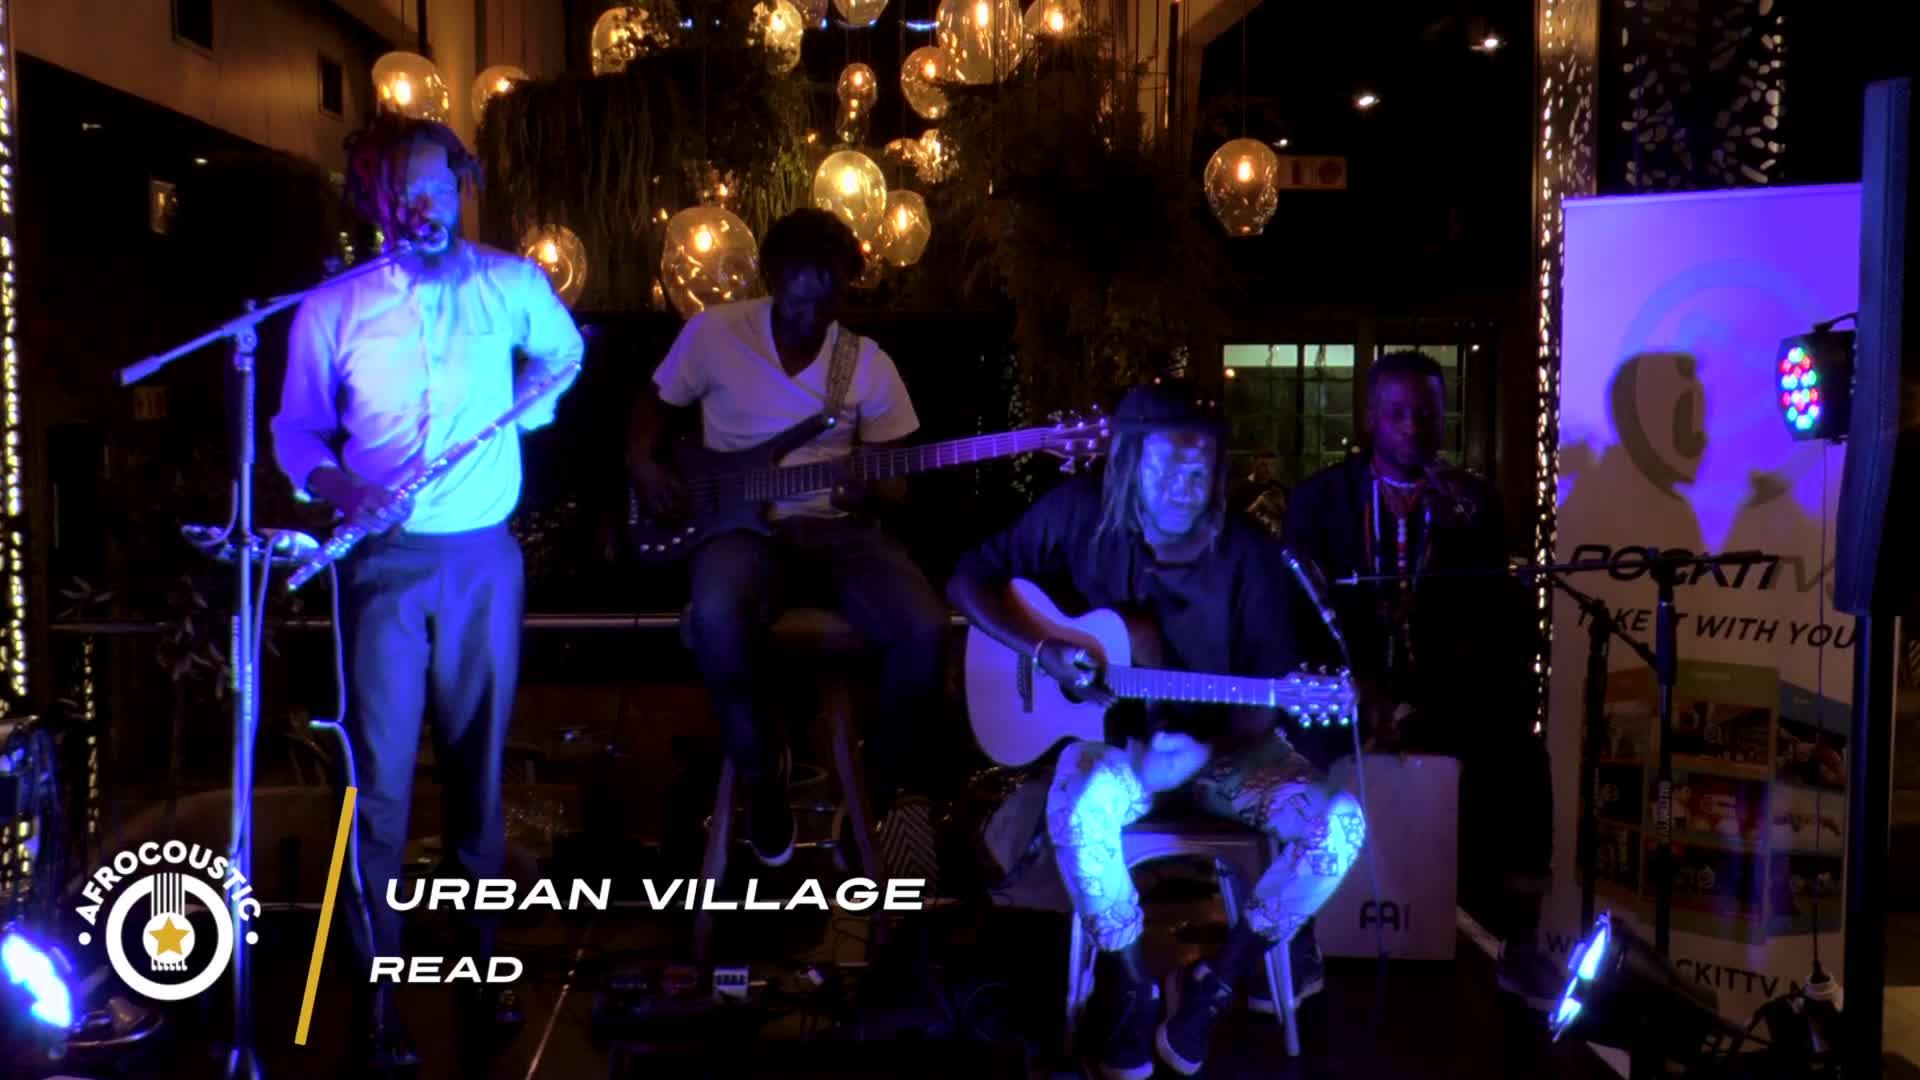 Afrocoustic - Urban Village - Read